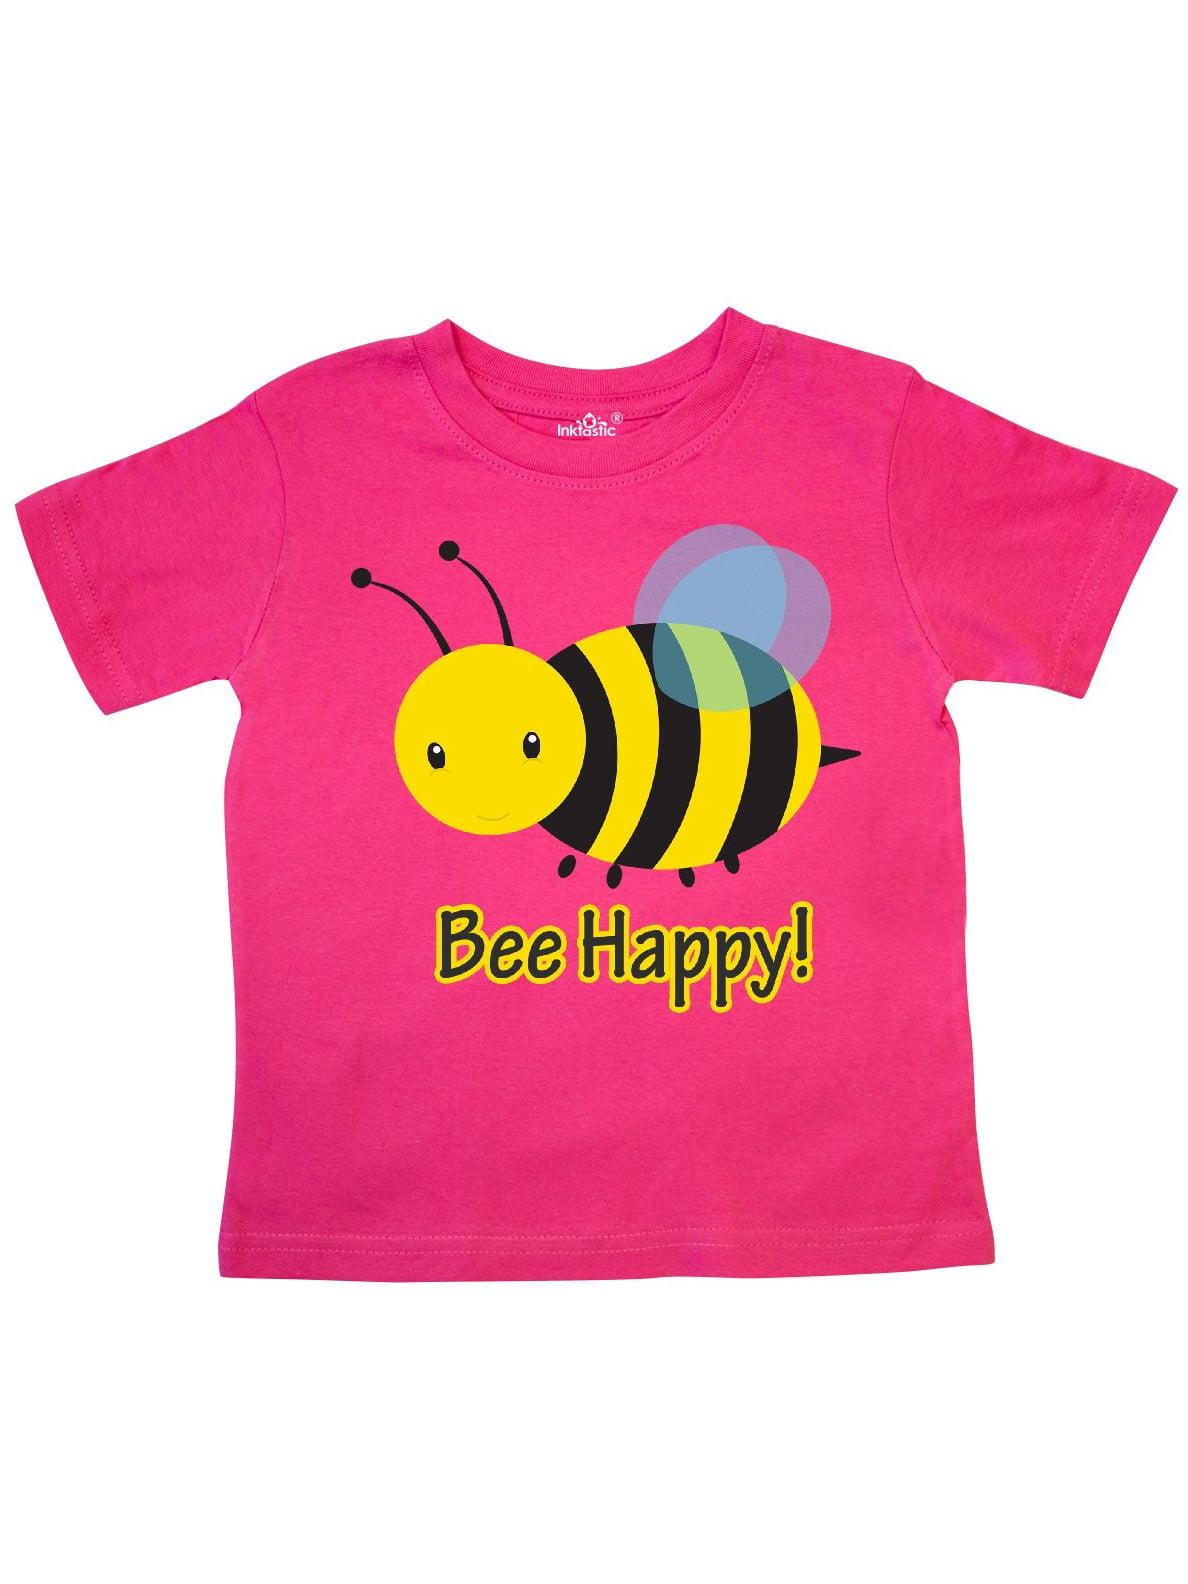 Bee Happy! Toddler T-Shirt